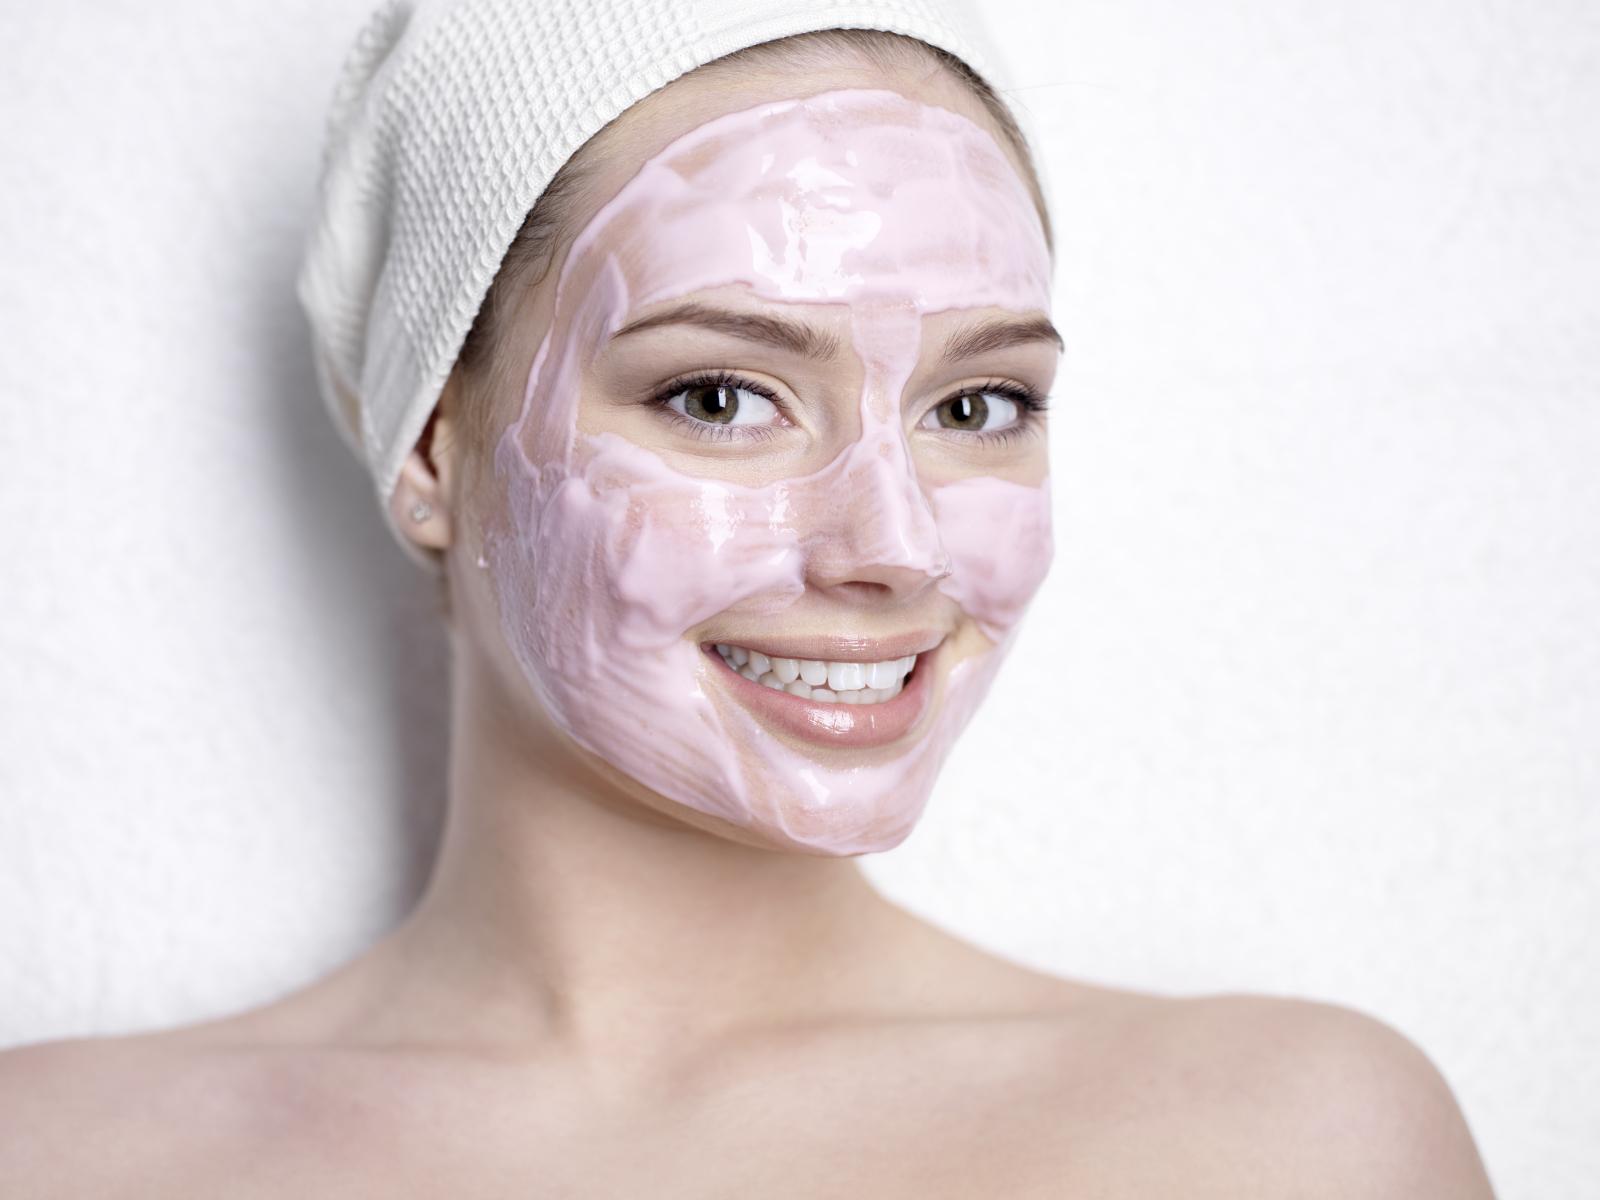 Maschera viso antirughe